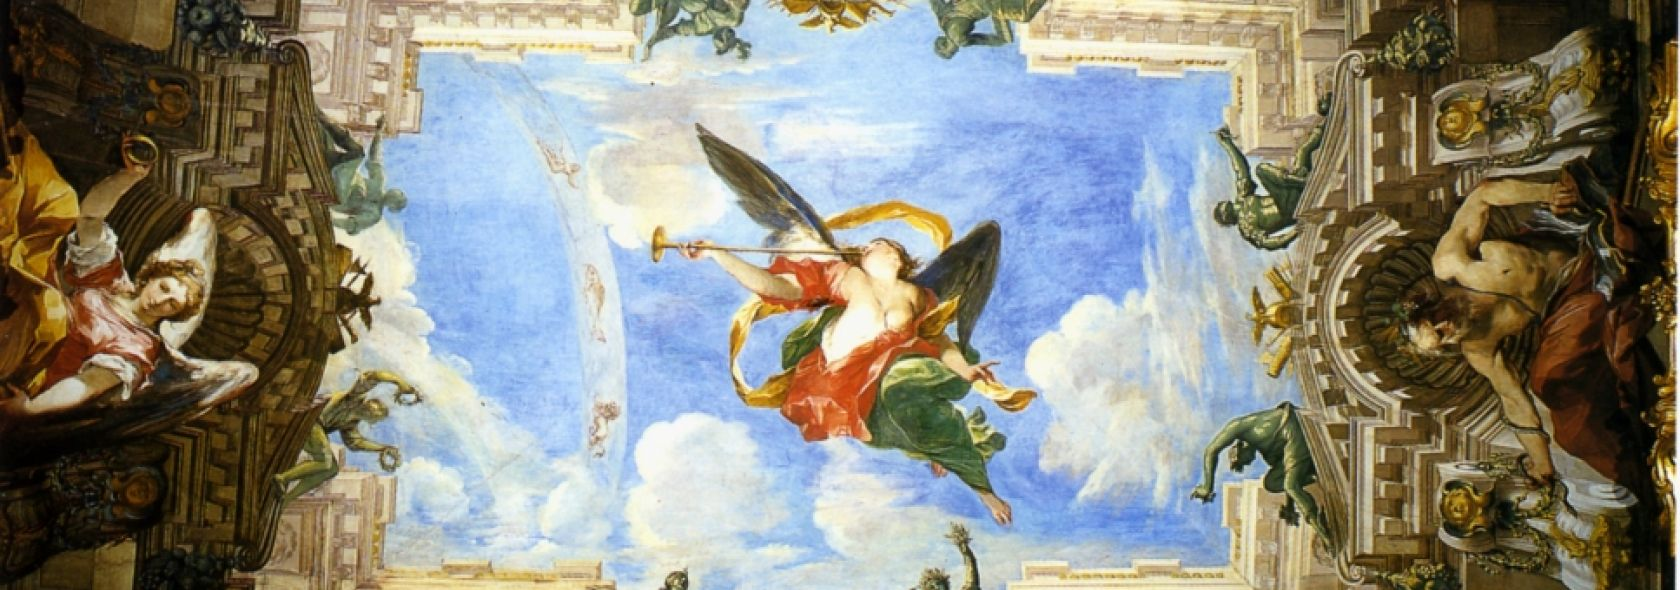 Valerio Castello - La Fama Balbi